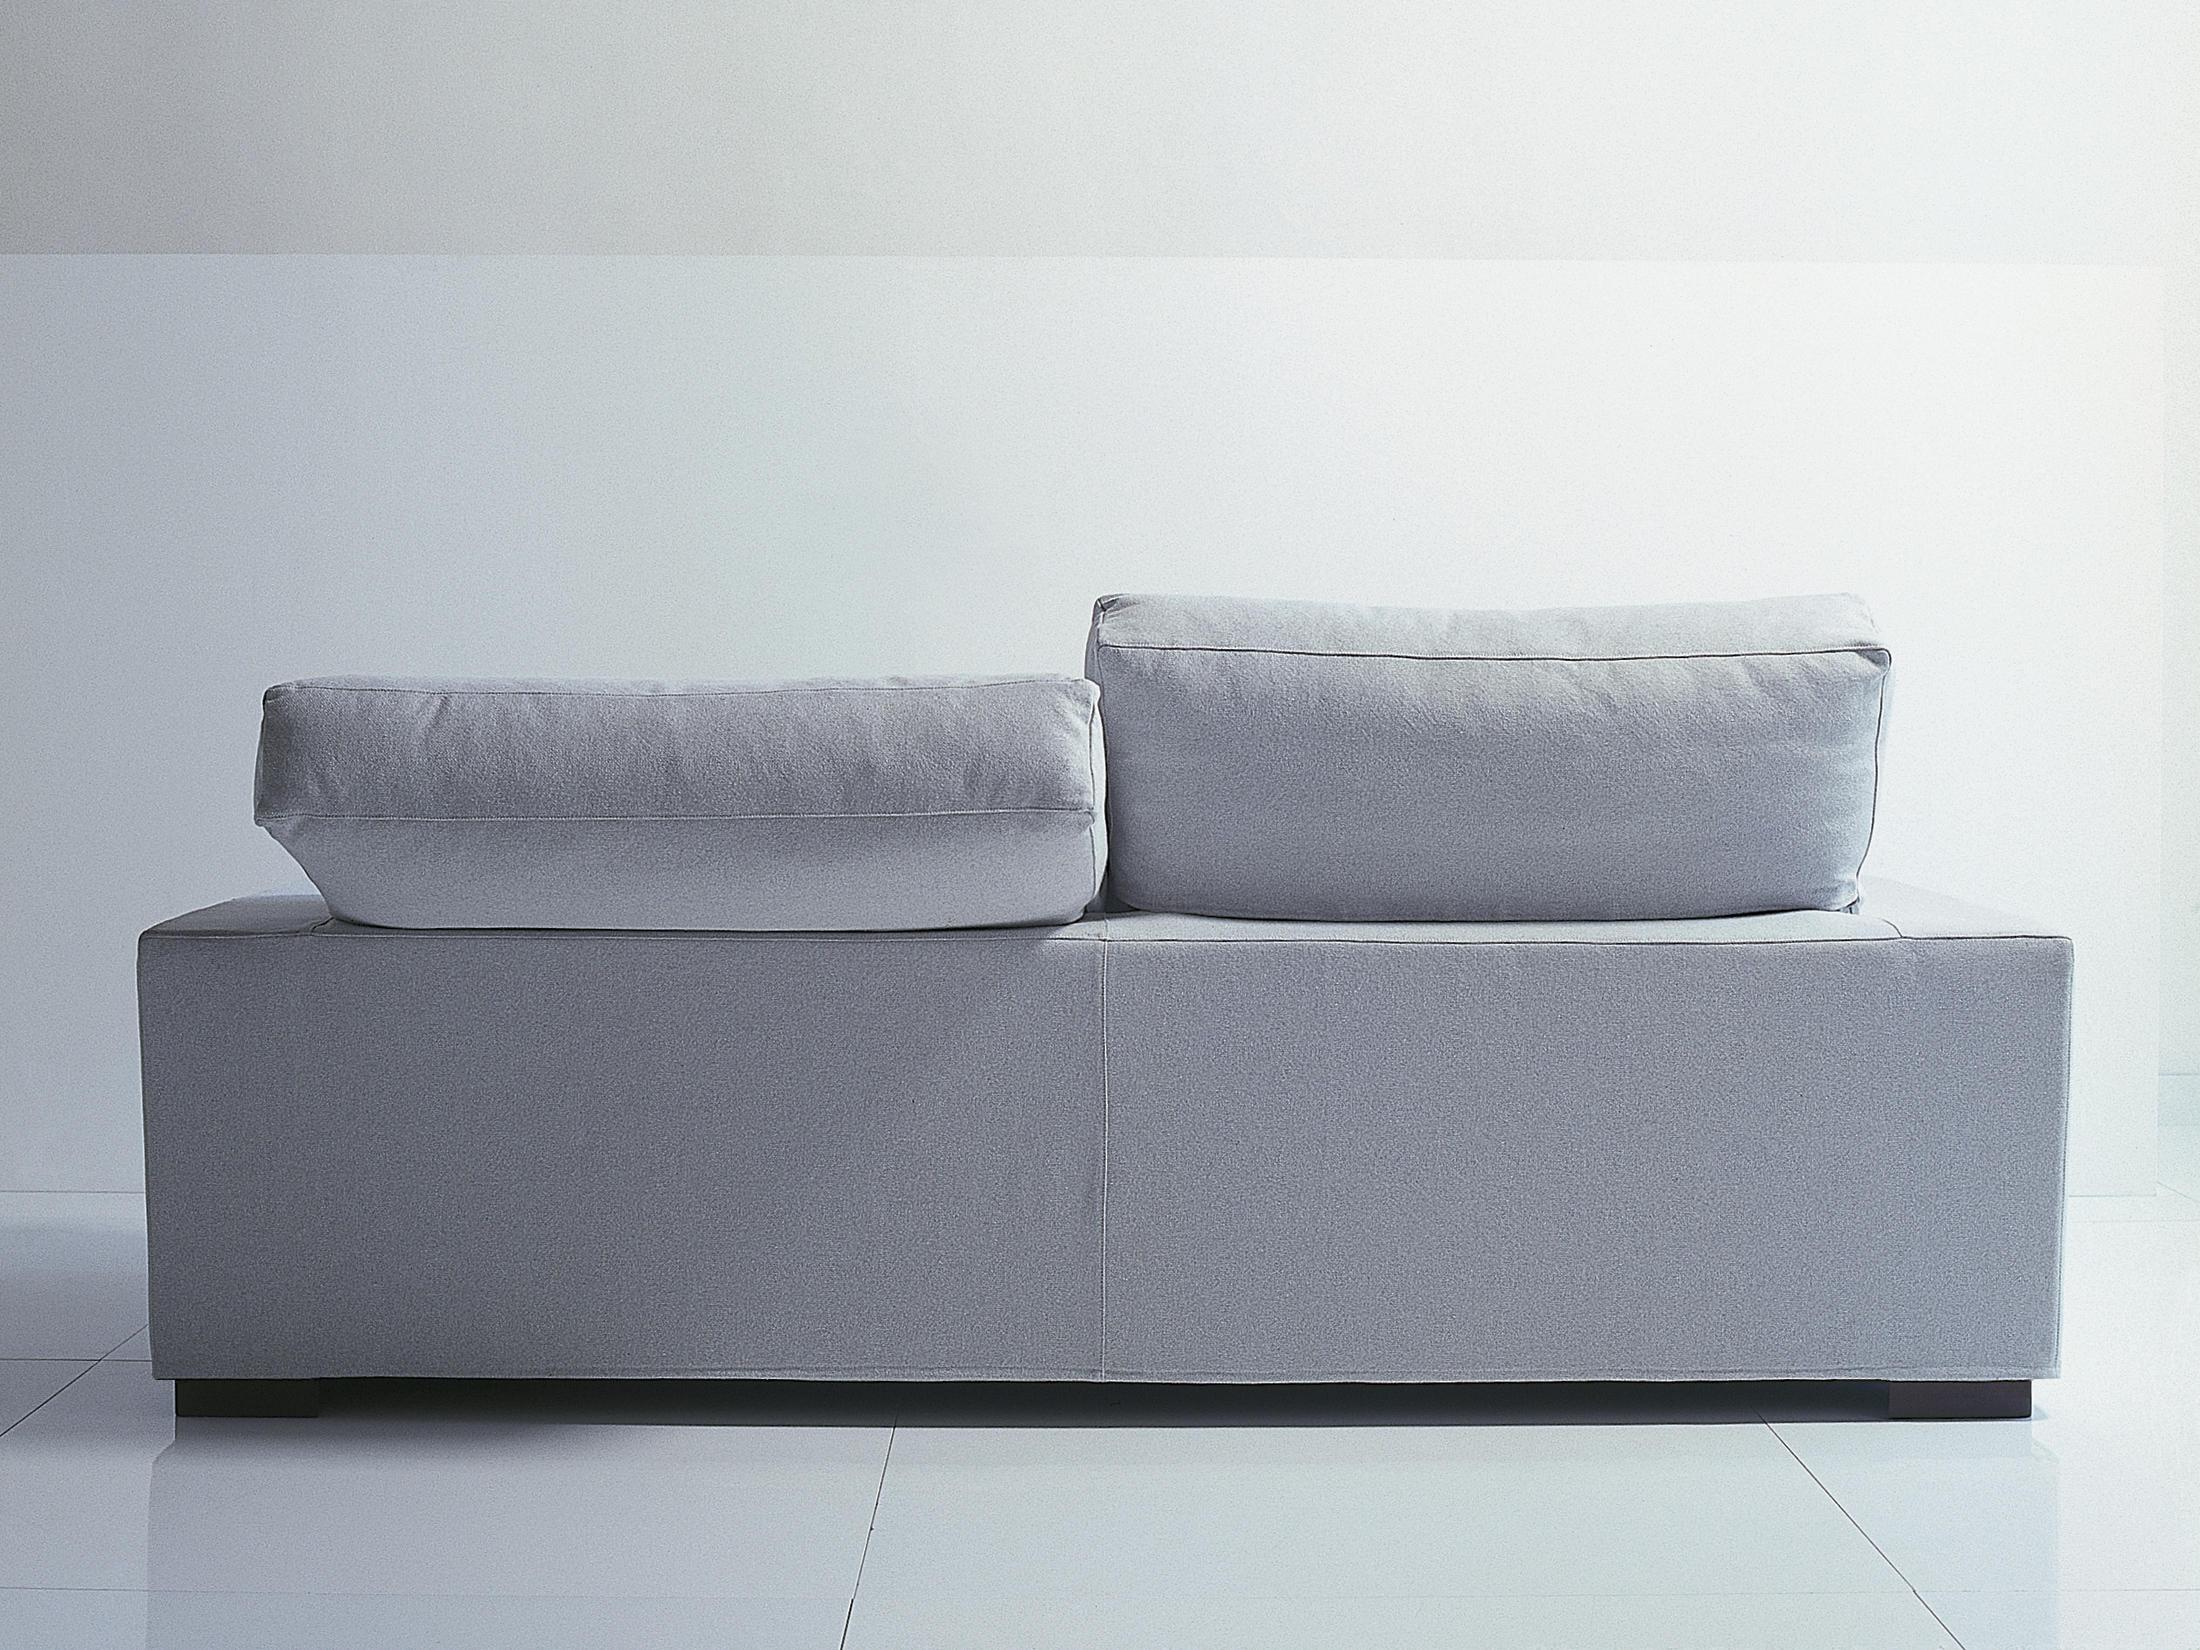 Cubic lounge sofas from rafemar architonic - Rafemar sofas ...